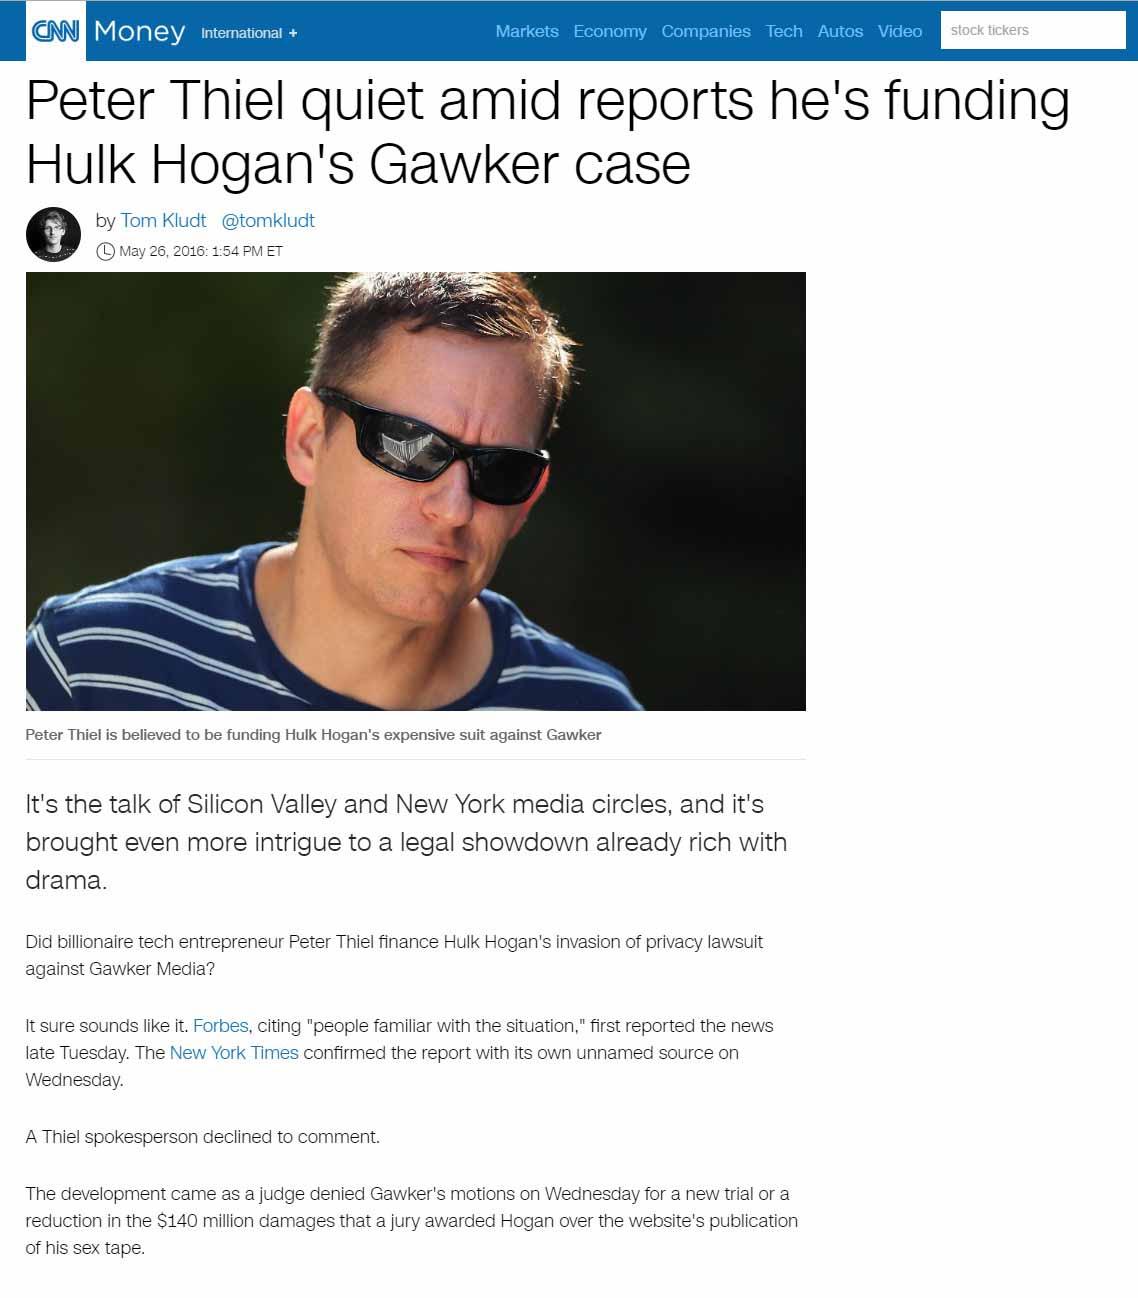 Peter Thiel Quiet Amid Reports He's Funding Hulk Hogan's Gawker Case